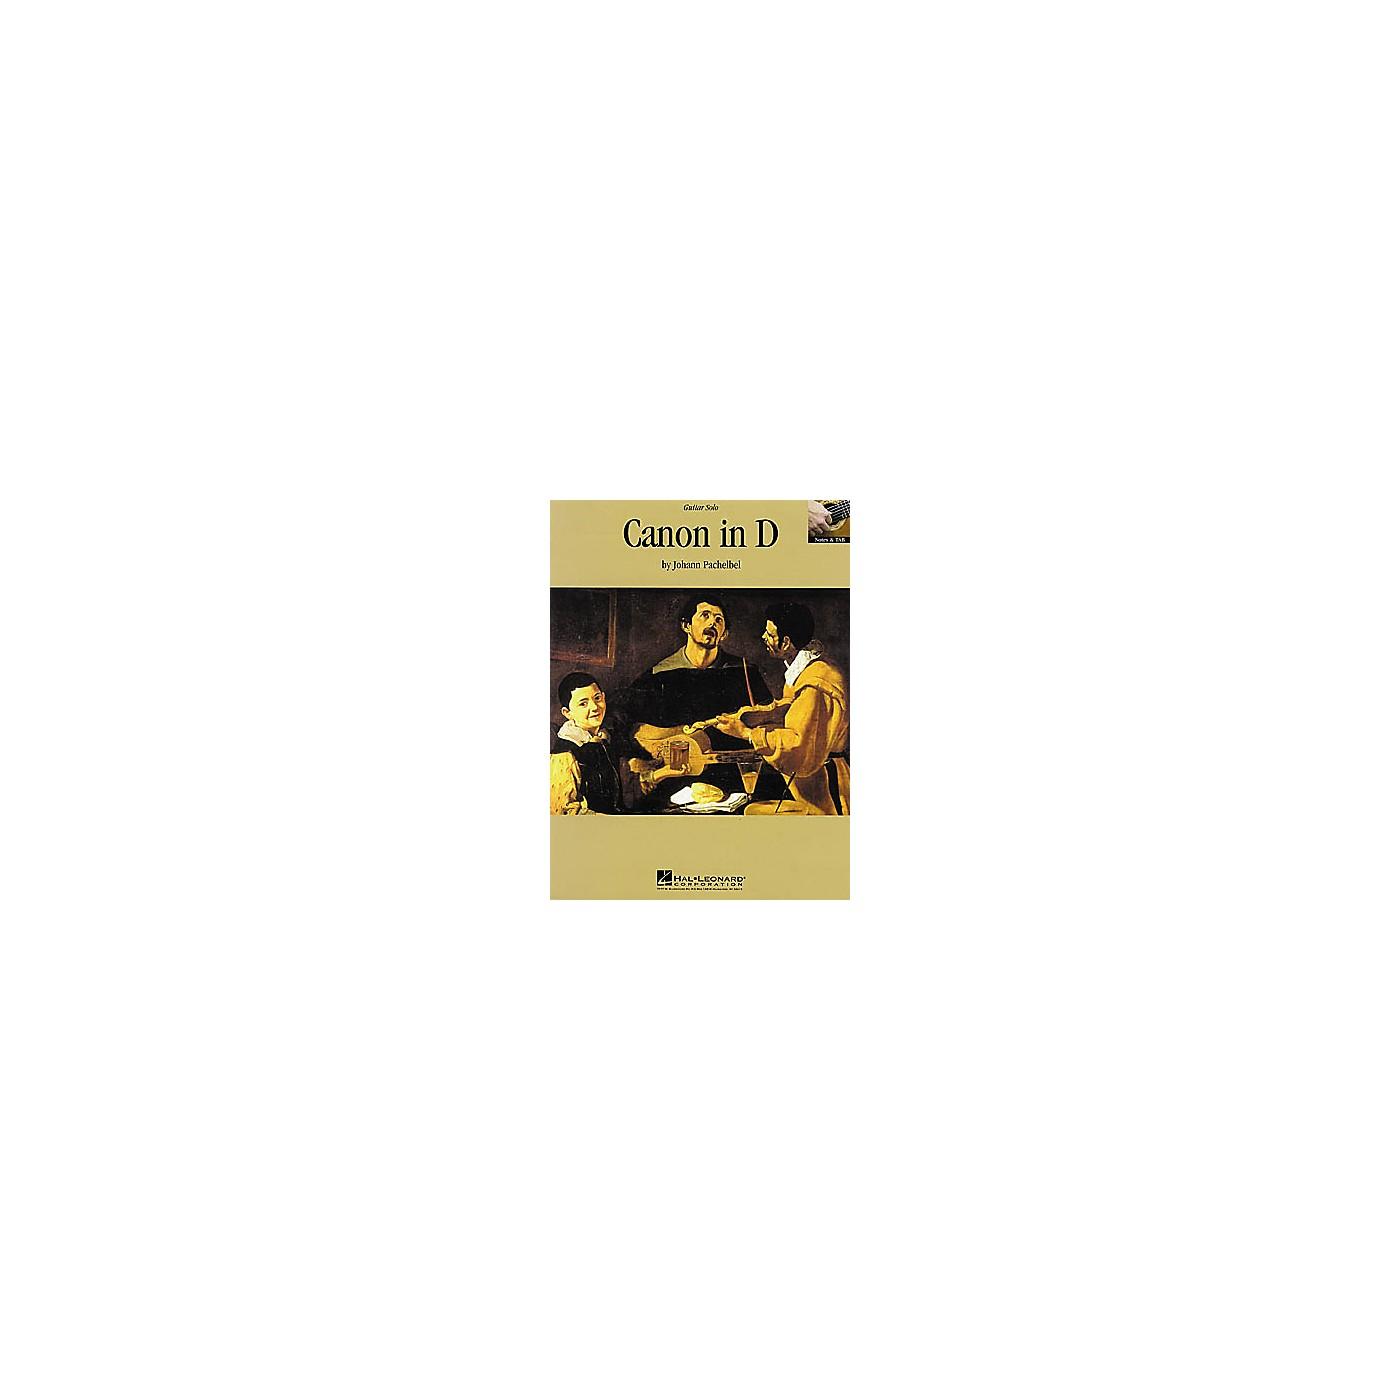 Hal Leonard Canon in D Guitar Sheet Music Book thumbnail